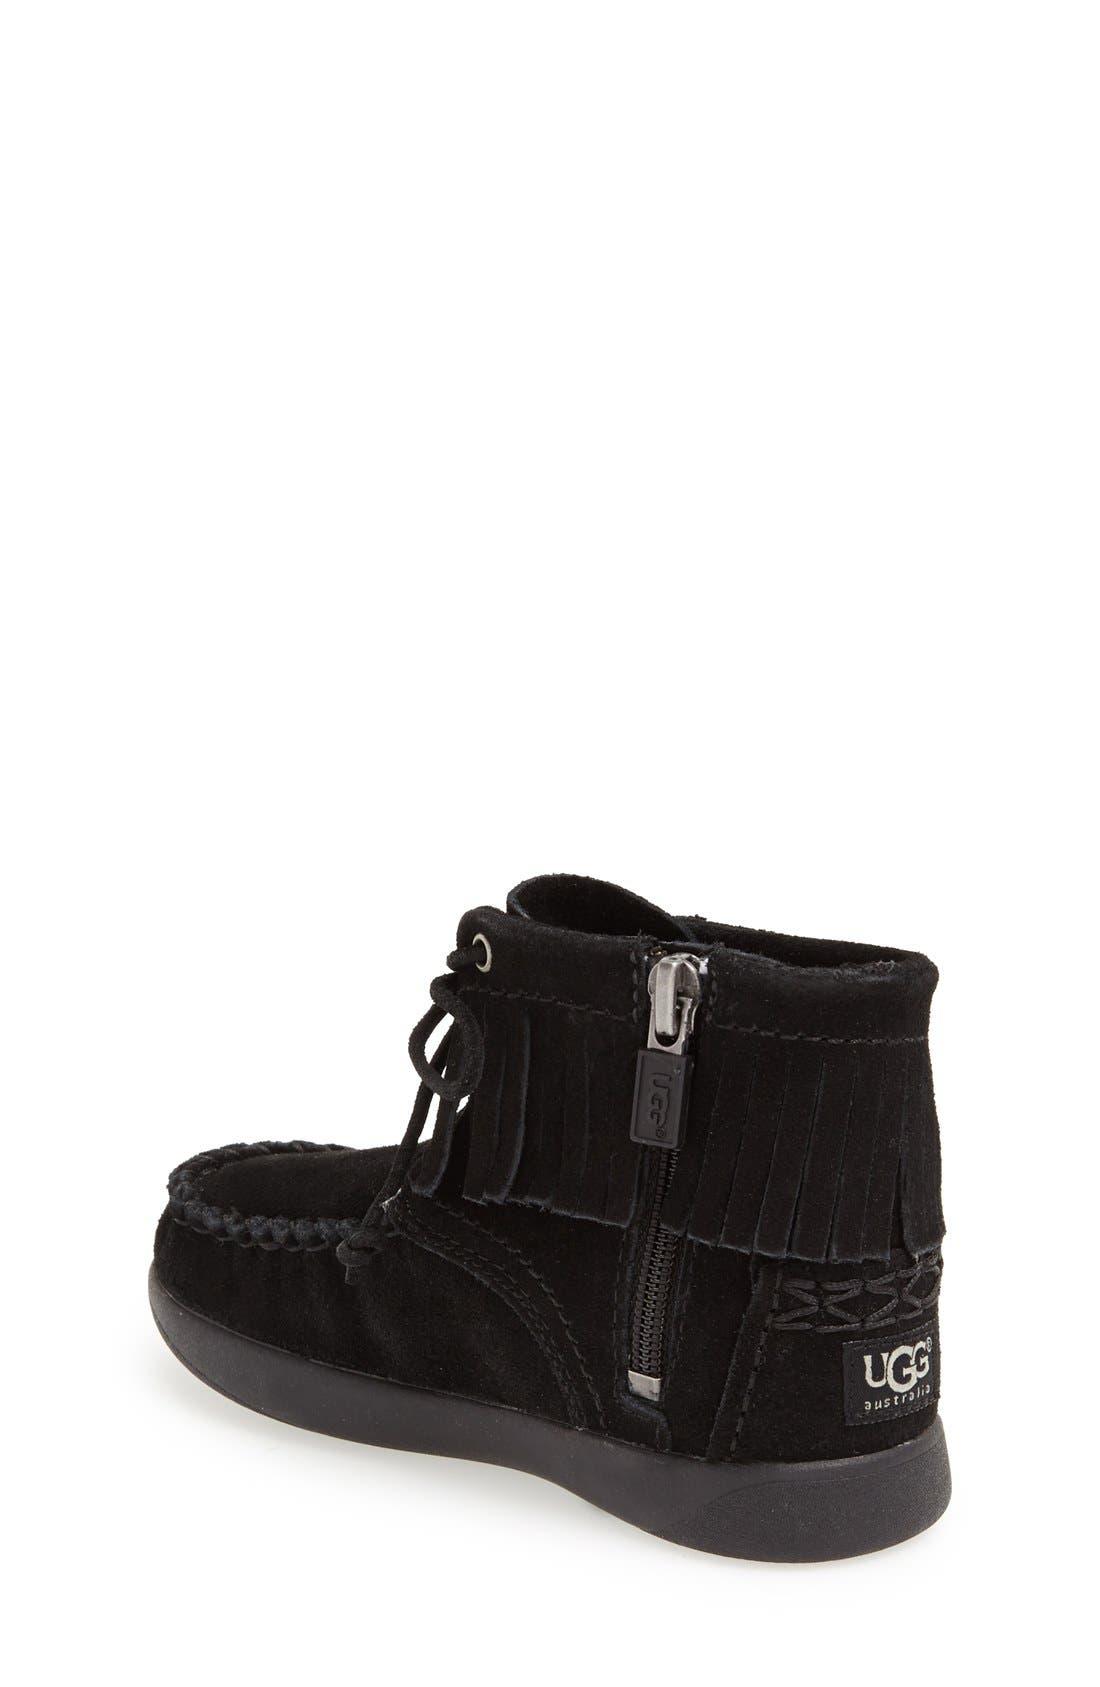 Alternate Image 2  - UGG® Australia 'Anisa' Moccasin Boot (Walker & Toddler)